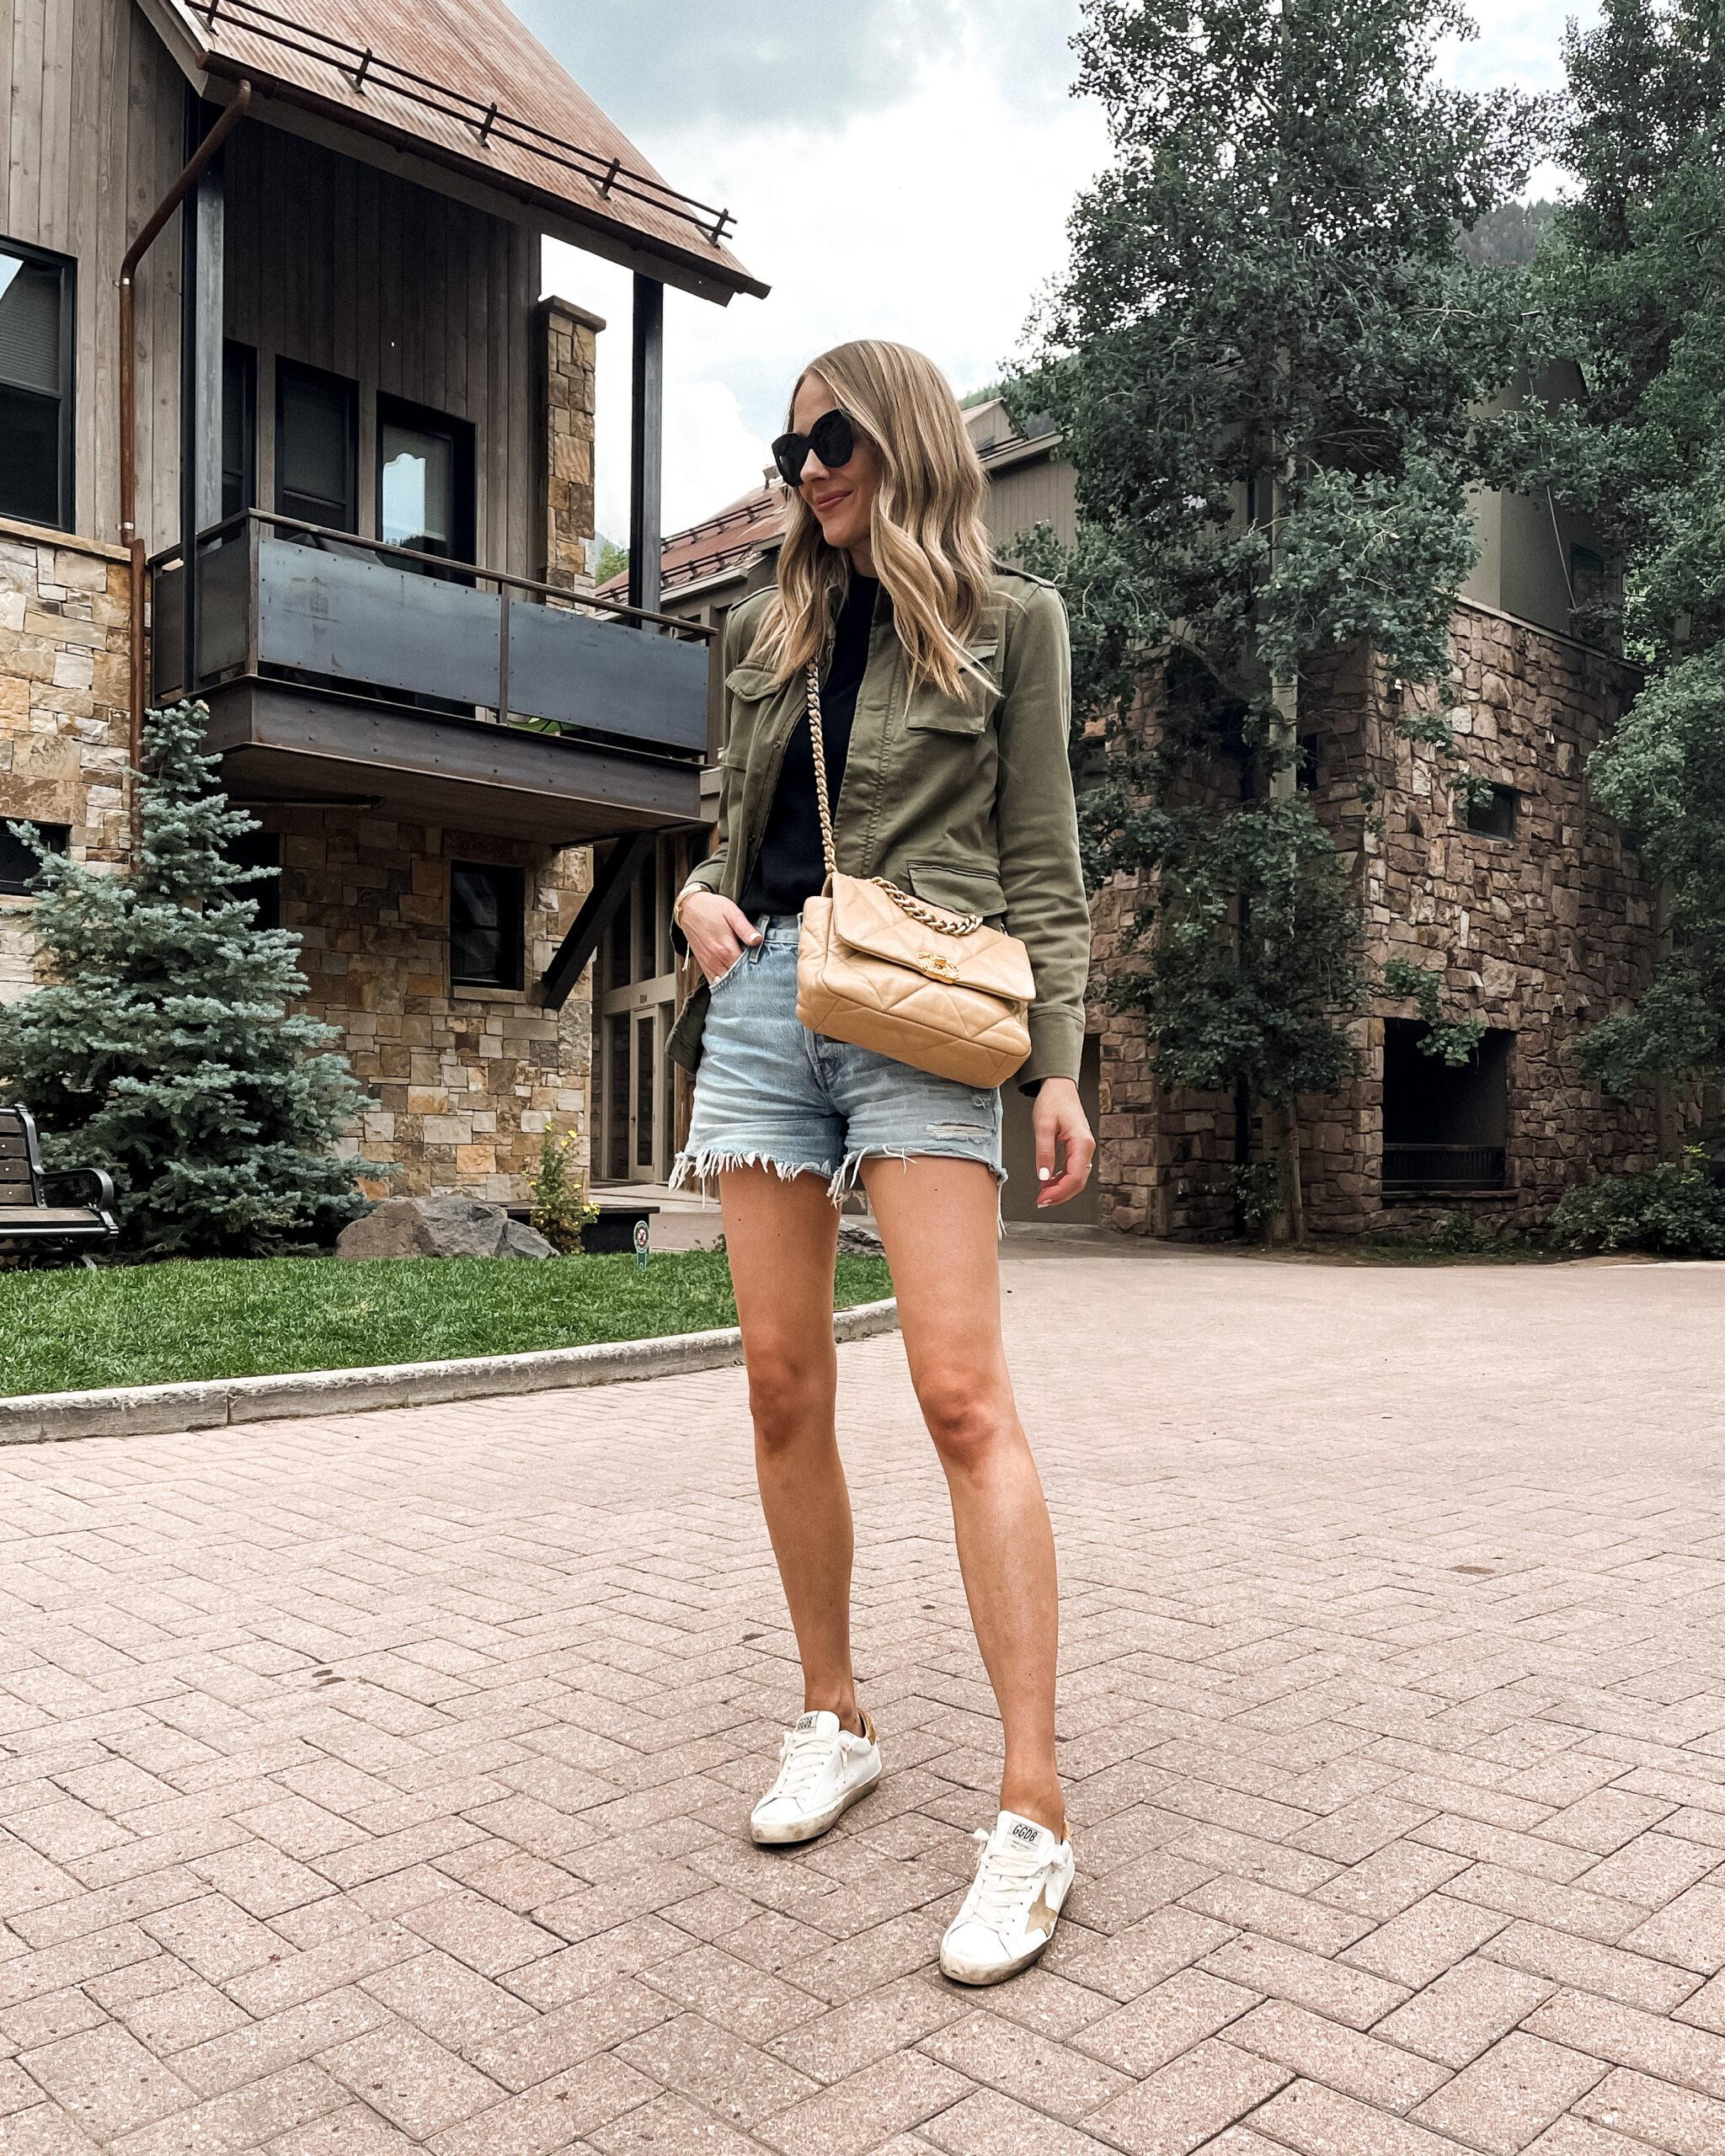 Fashion Jackson Wearing Anine Bing Green Utility Jacket AGOLDE Denim Shorts Golden Goose Sneakers Chanel 19 Beige Handbag